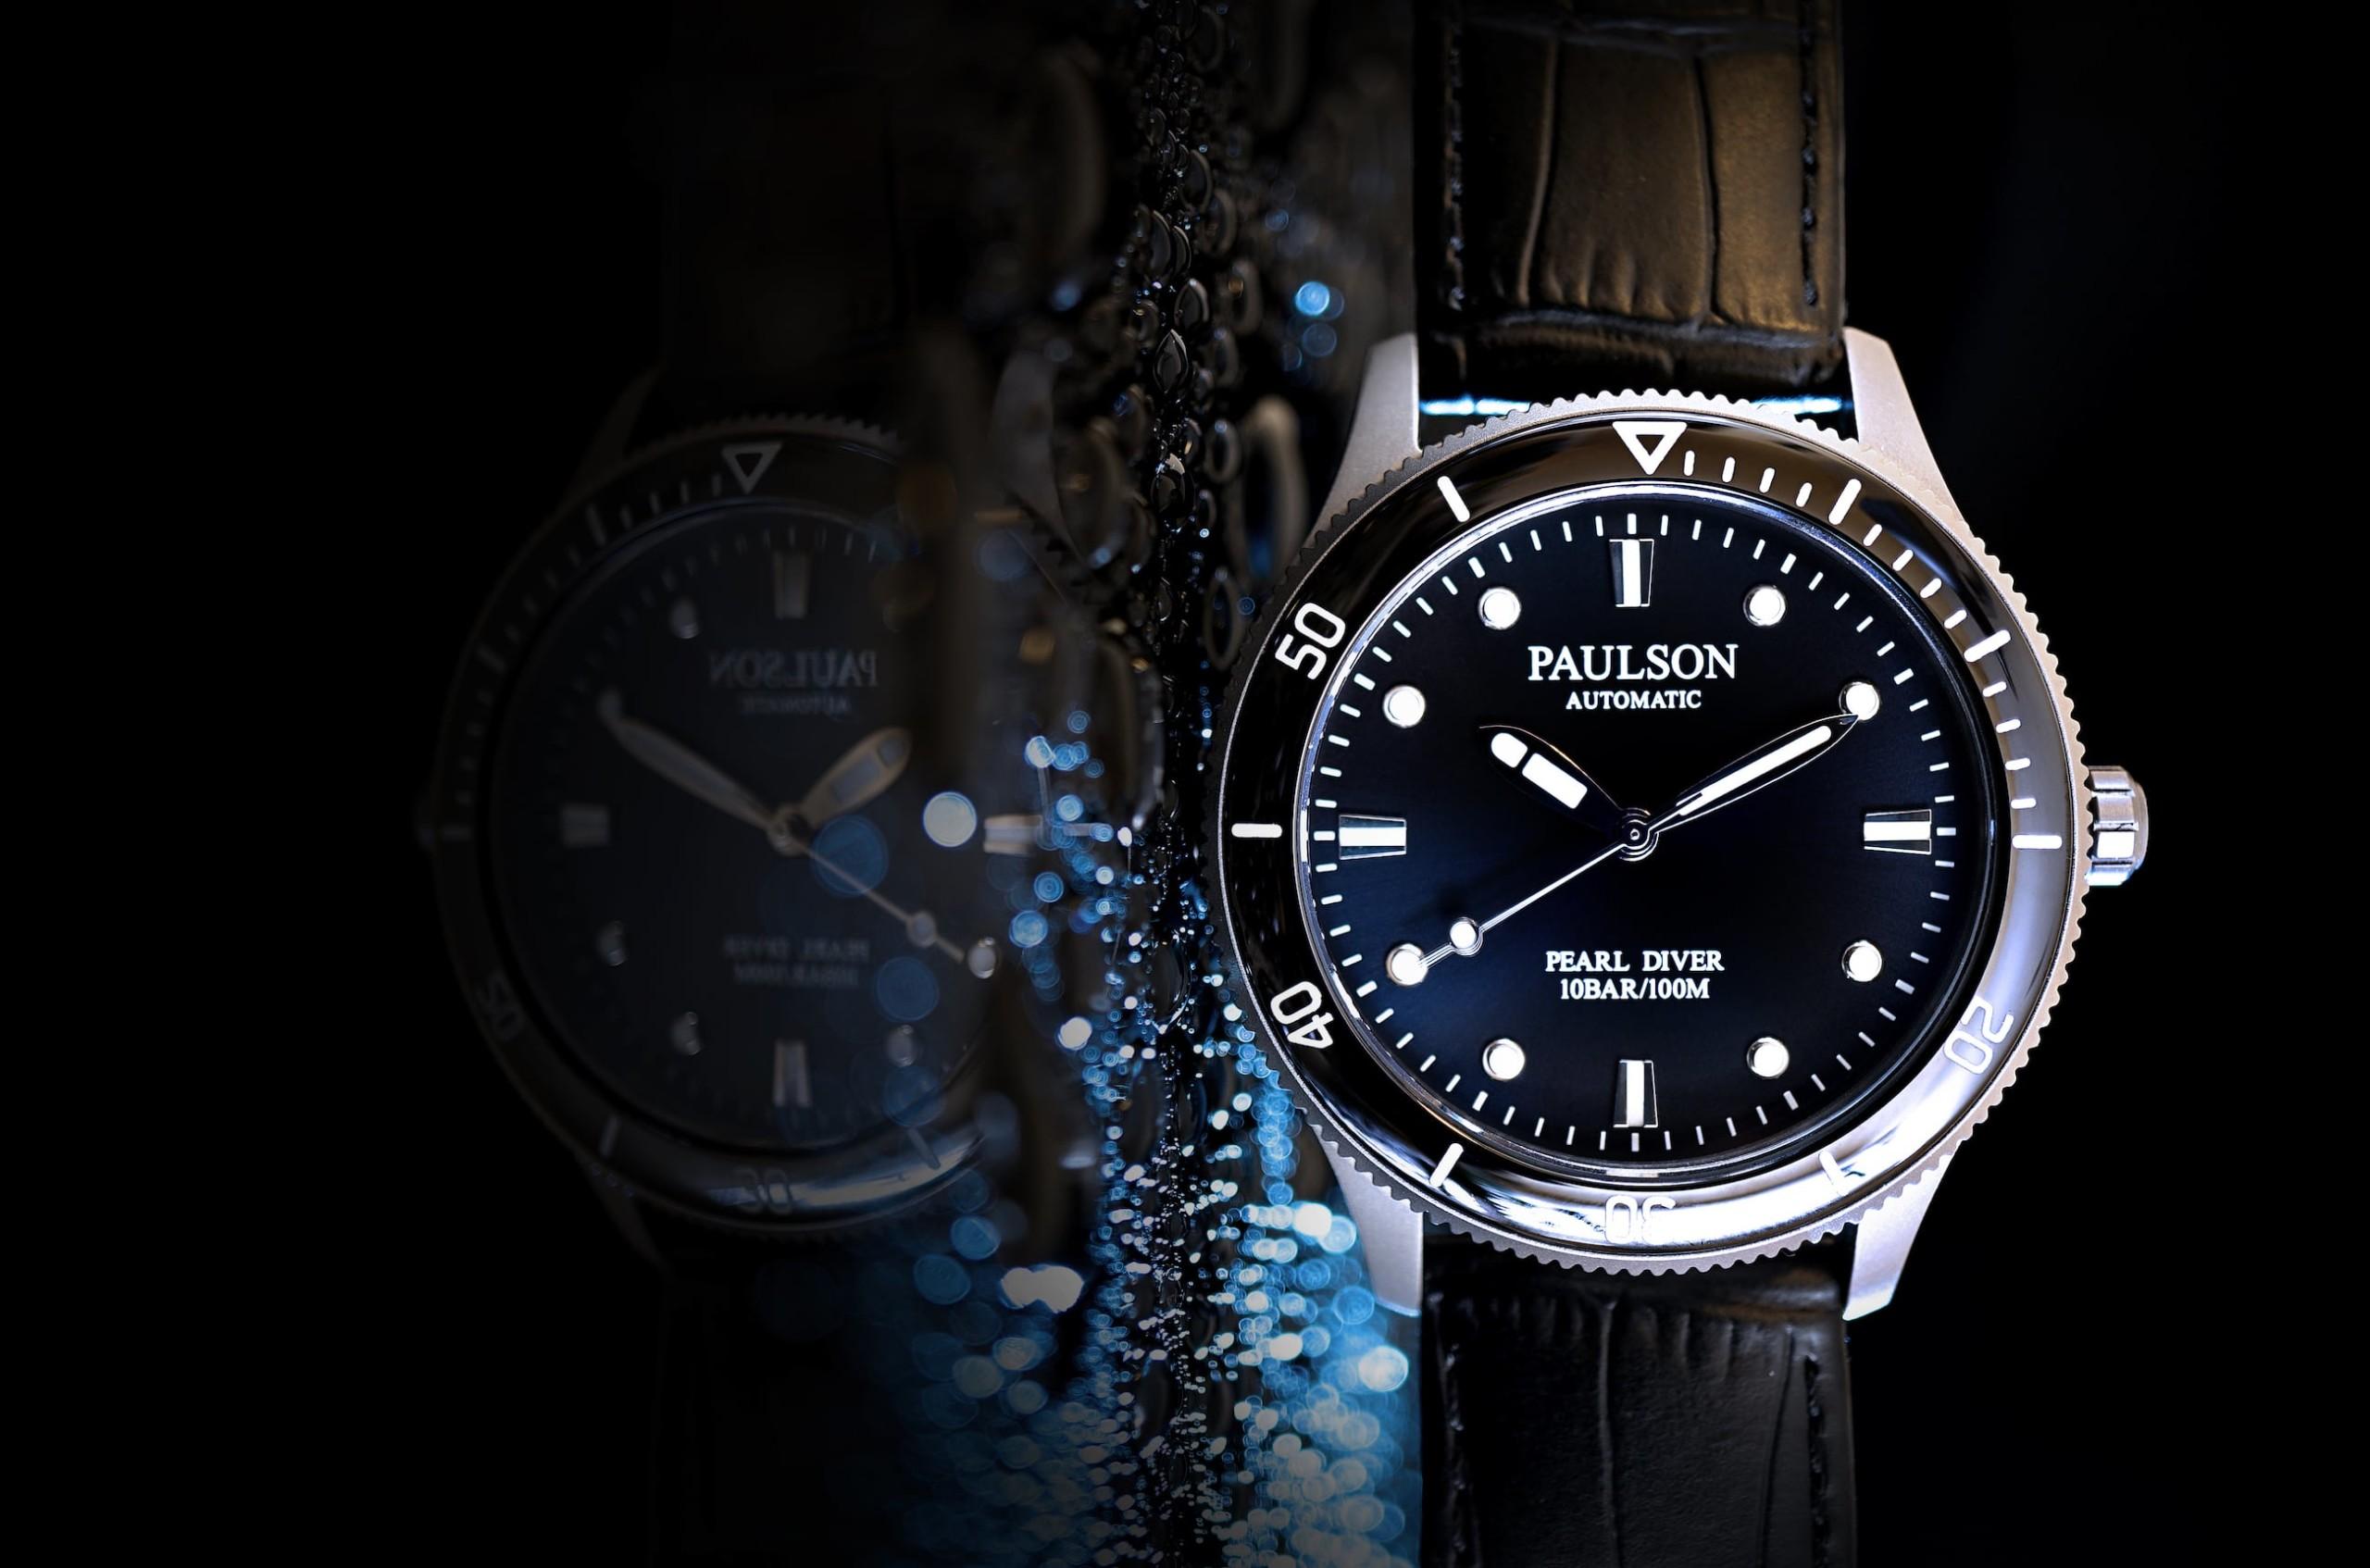 Paulson Pearl Diver Titanium Automatic Watch